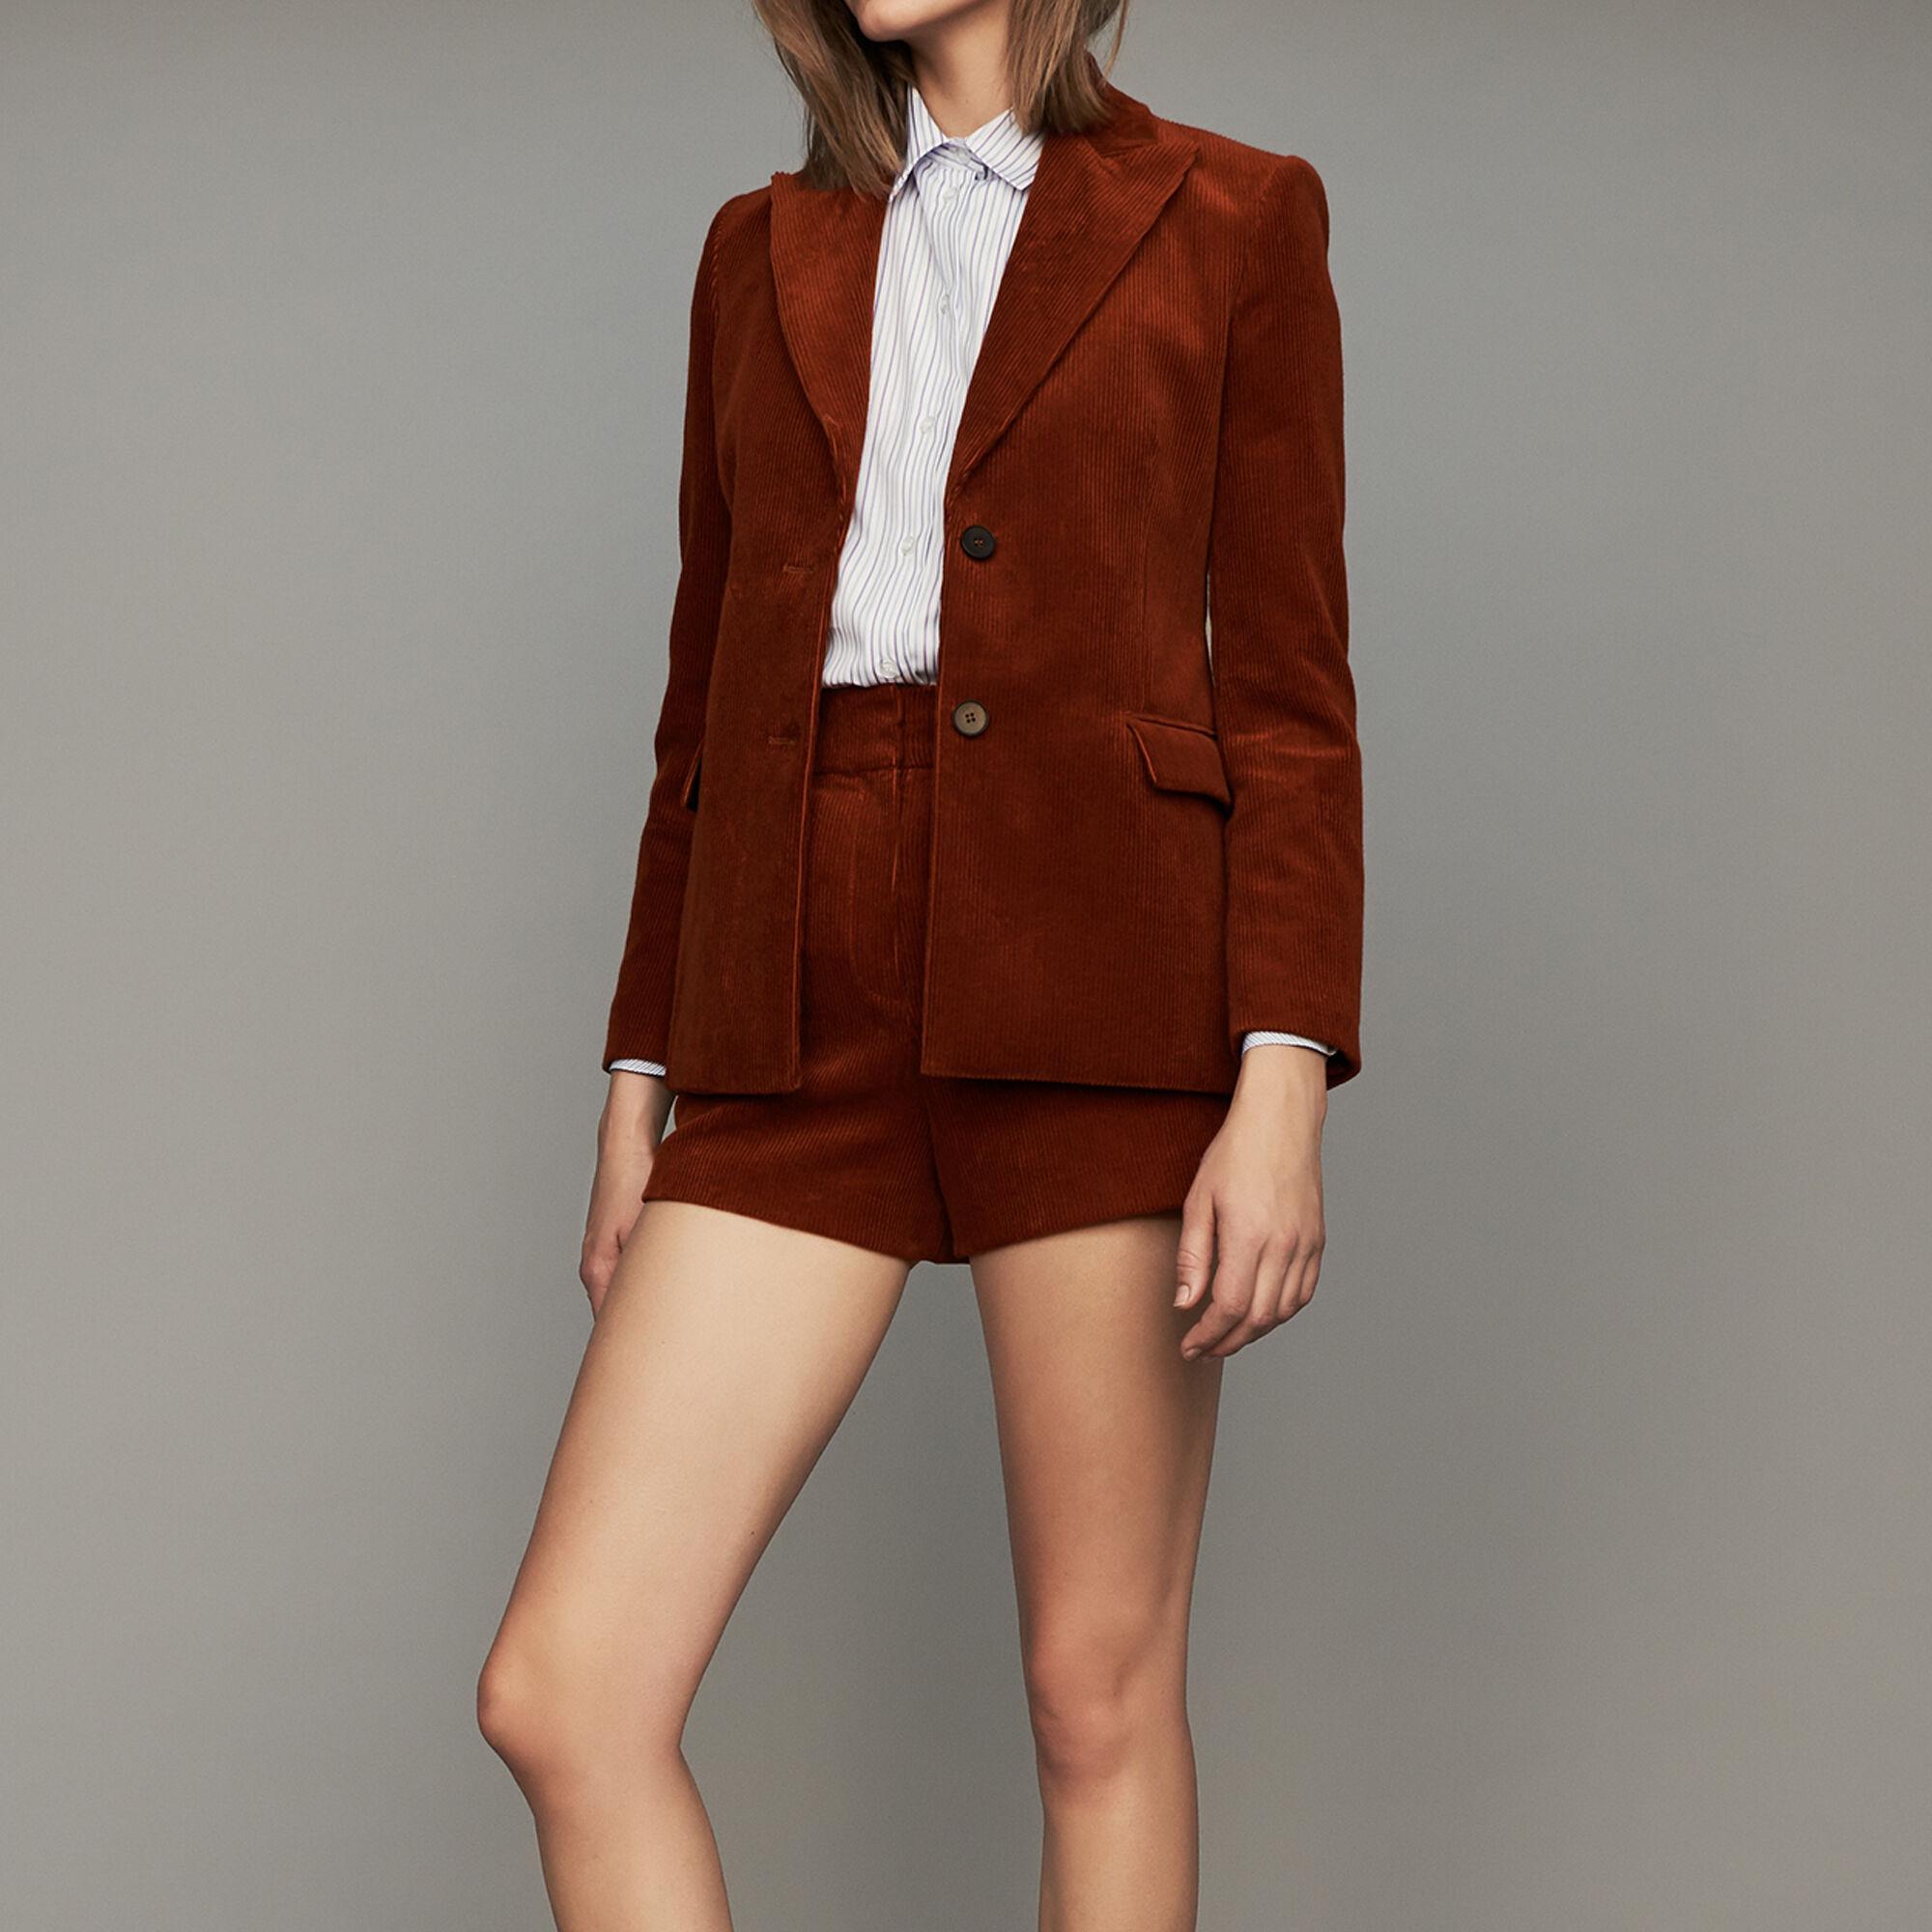 Veste tailleur manteau